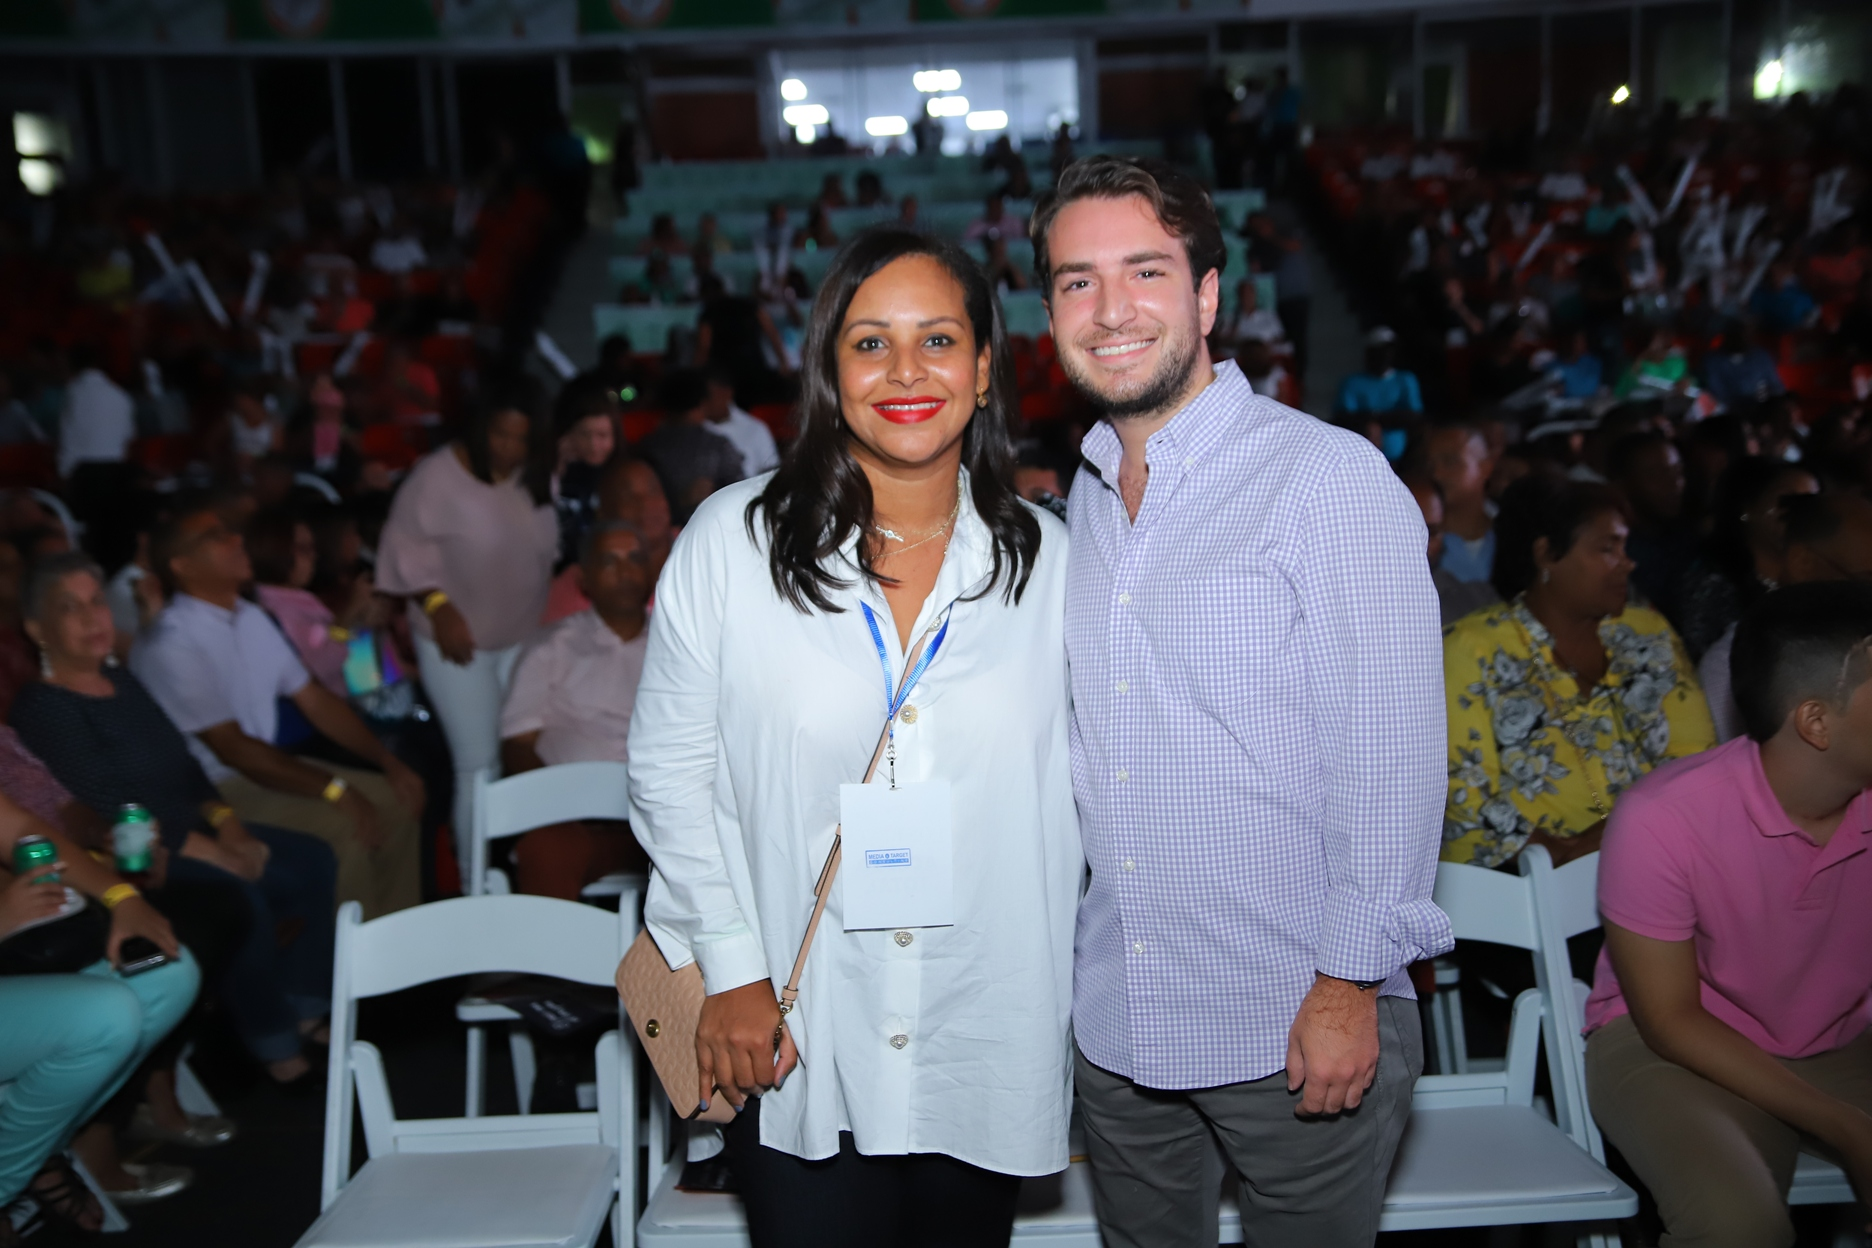 2. Zumaya Coldero y Michael Carrady